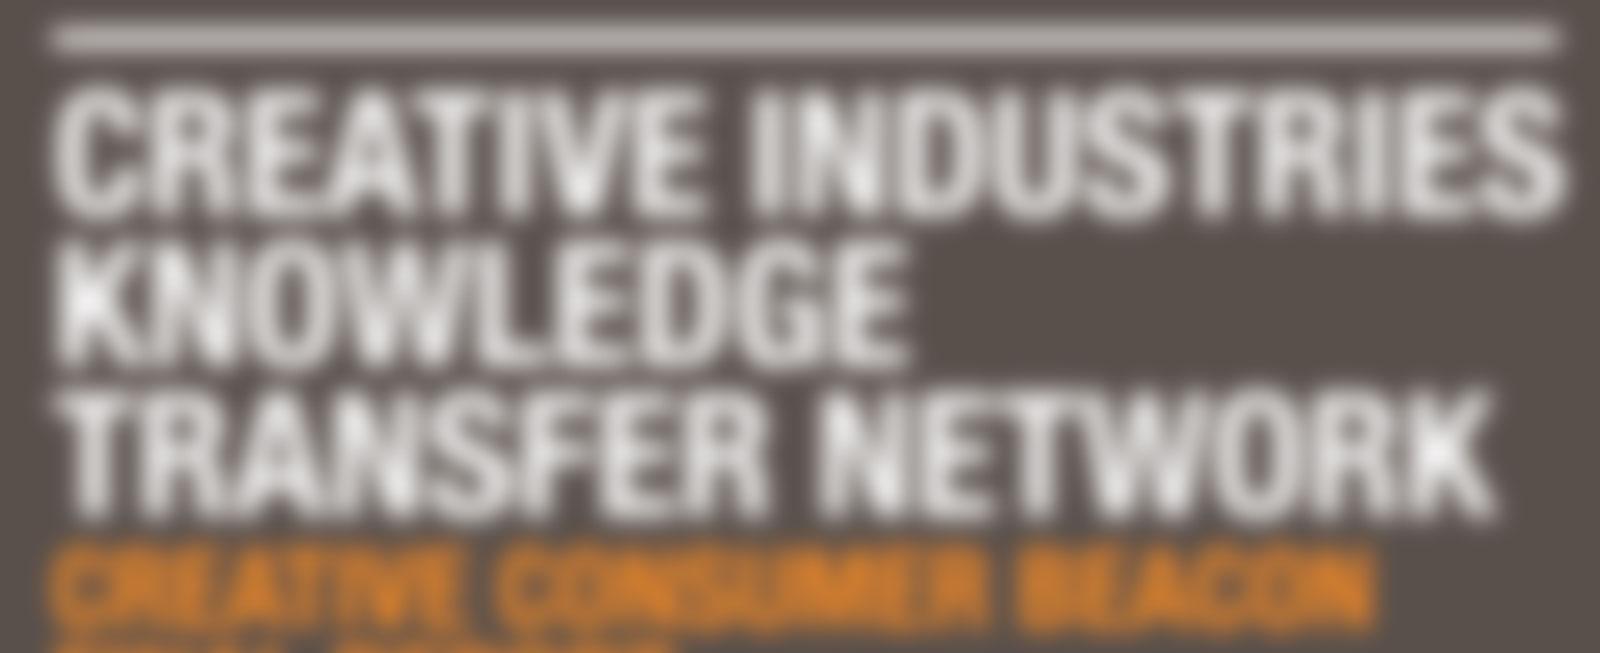 Creative Industries KTN: Creative Consumer Beacon Final Report